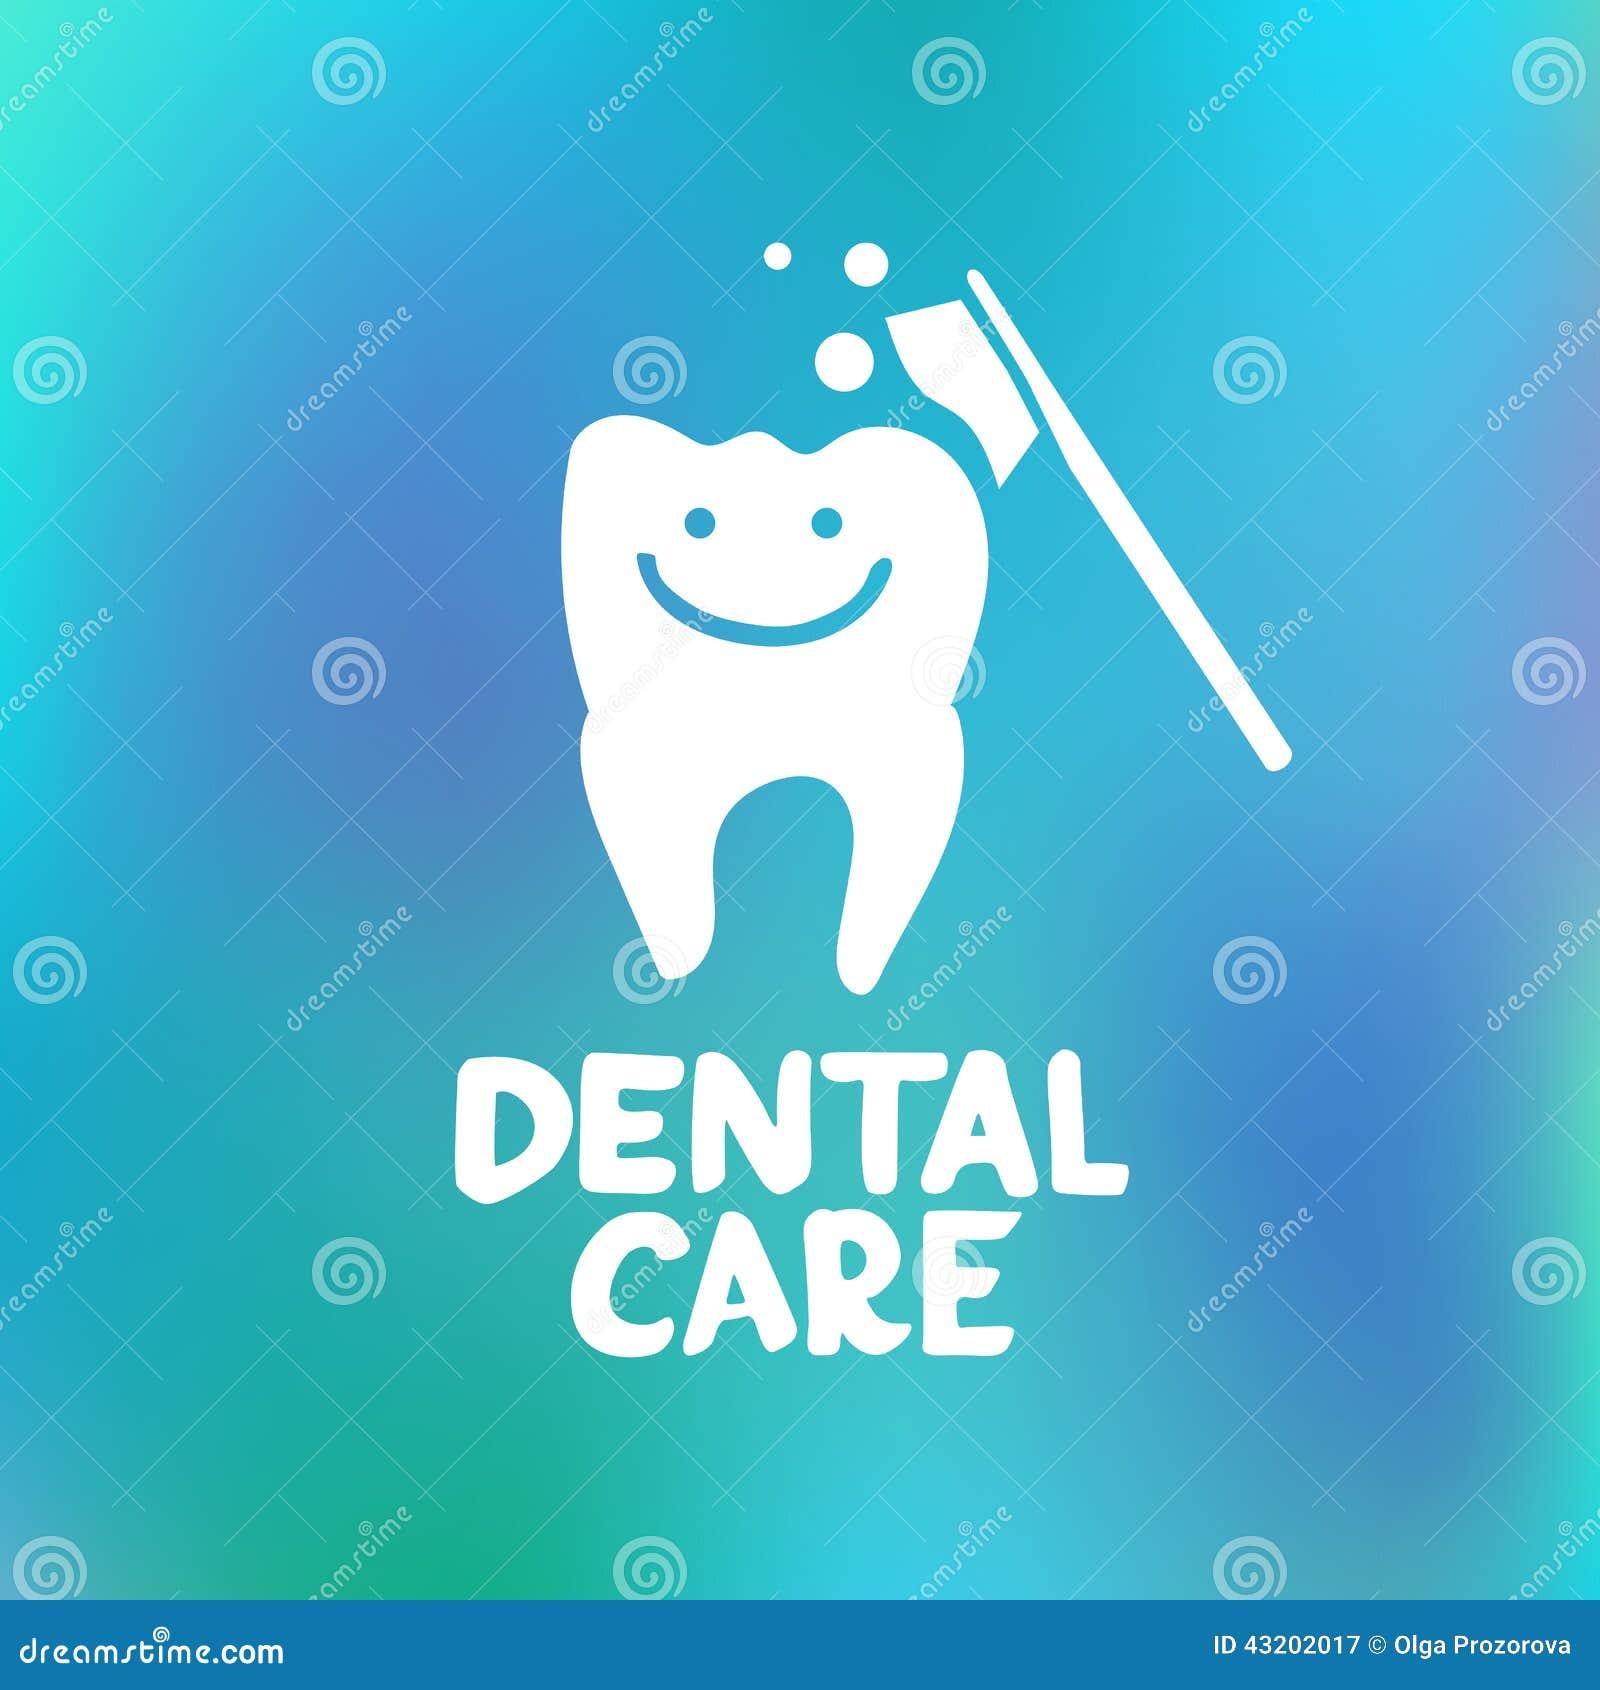 Dental Care Design Concept Stock Vector Image 43202017